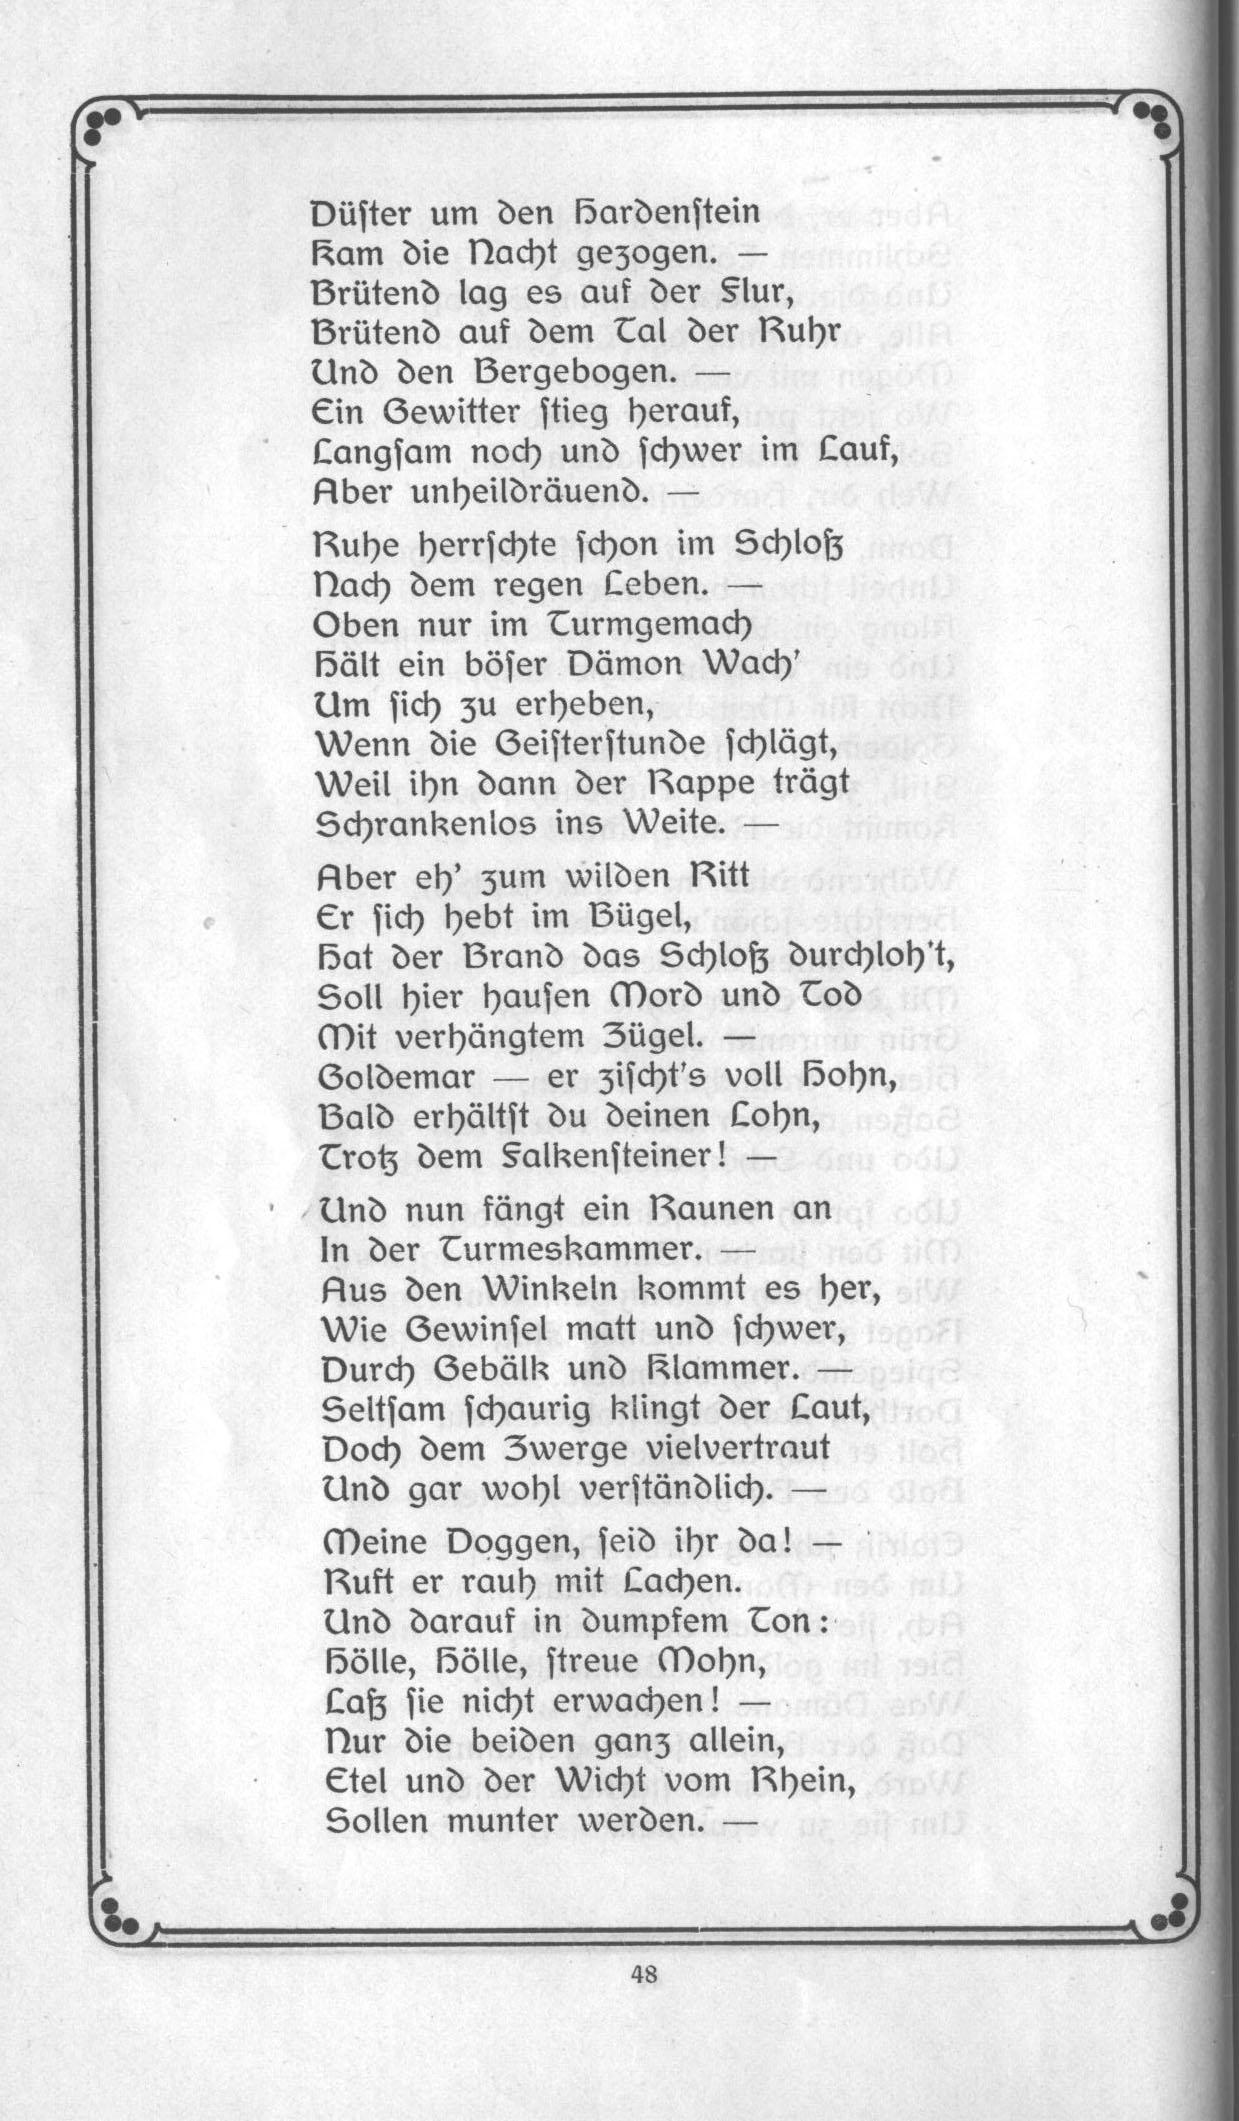 File:Was Die Ruhr Mir Sang (Kämpchen) 048.jpg - Wikimedia Commons